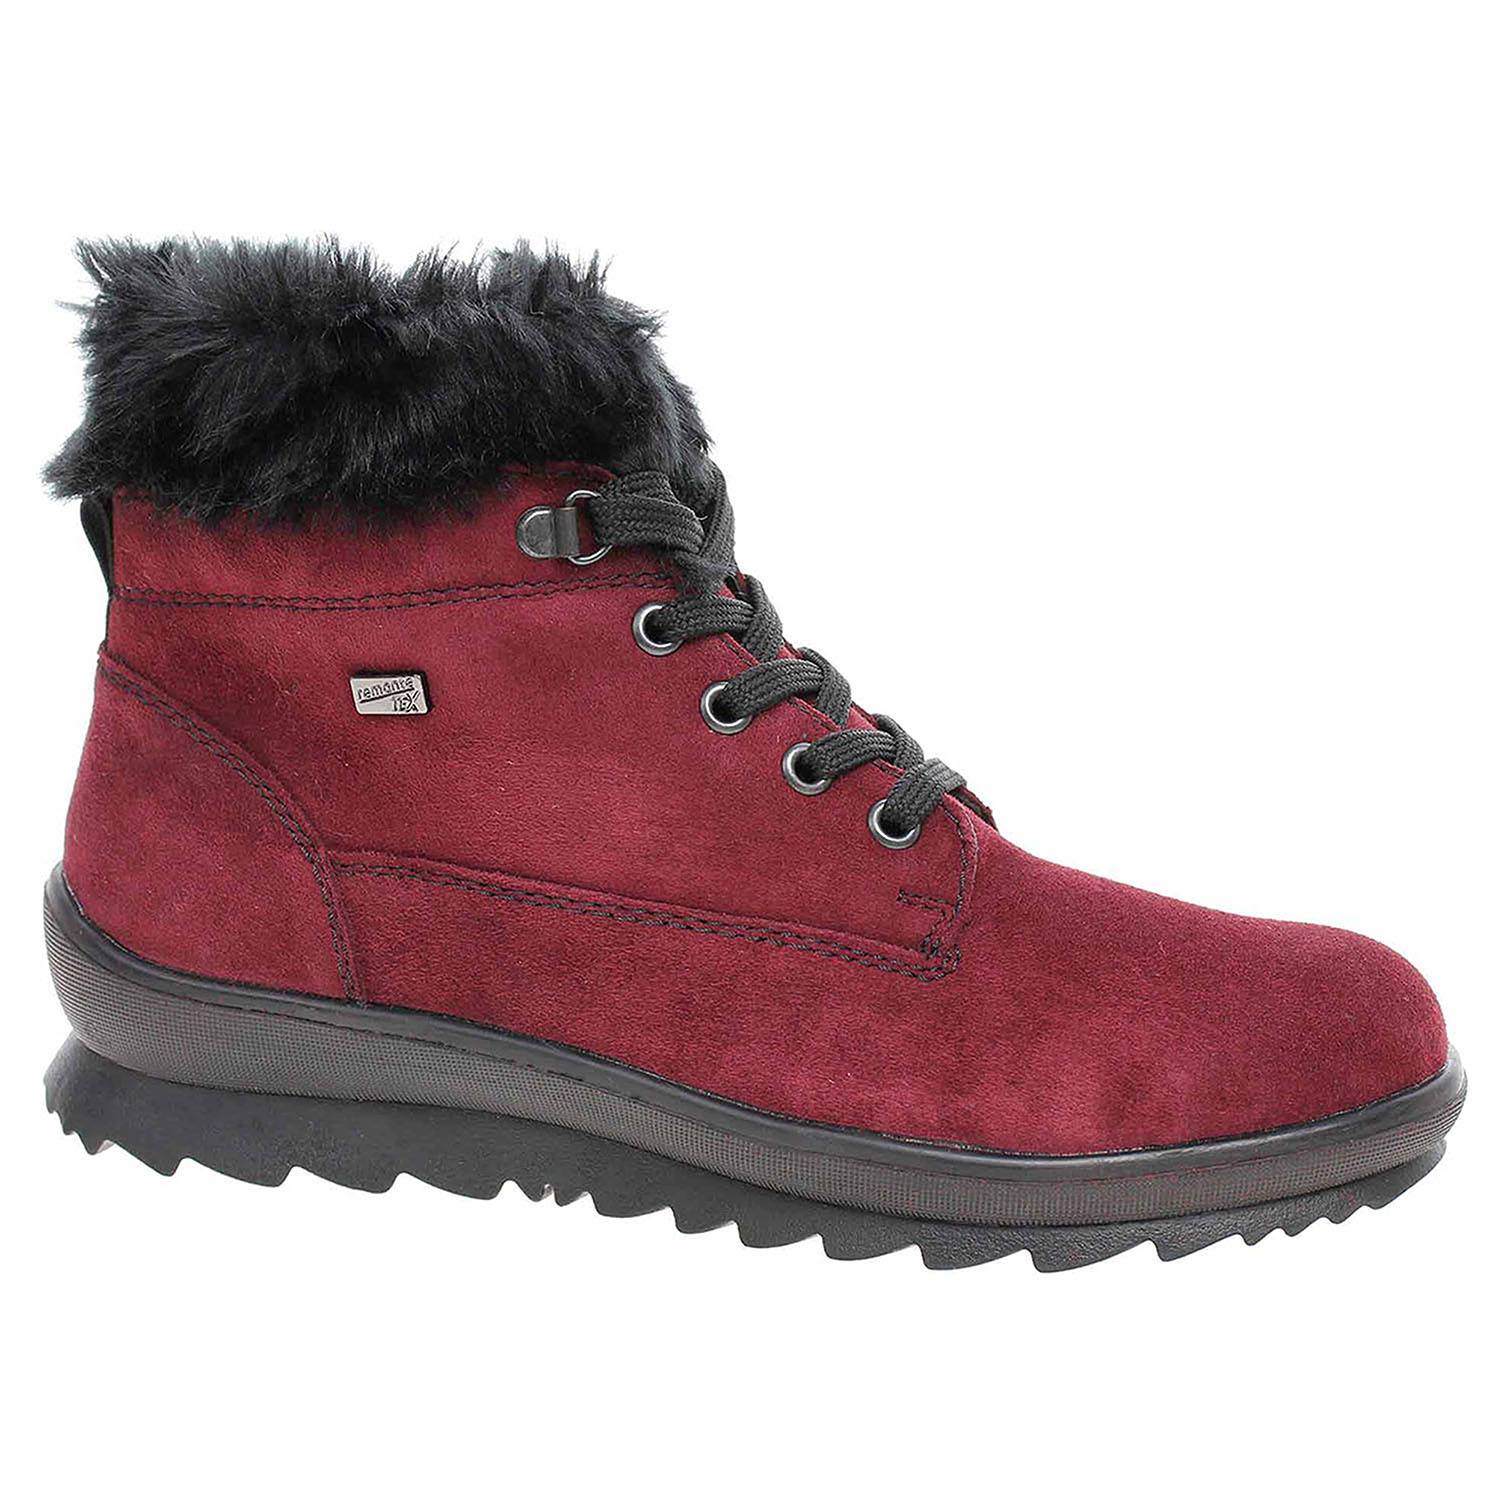 57405c0d46 detail Dámska členkové topánky Rieker R4370-30 rot kombi